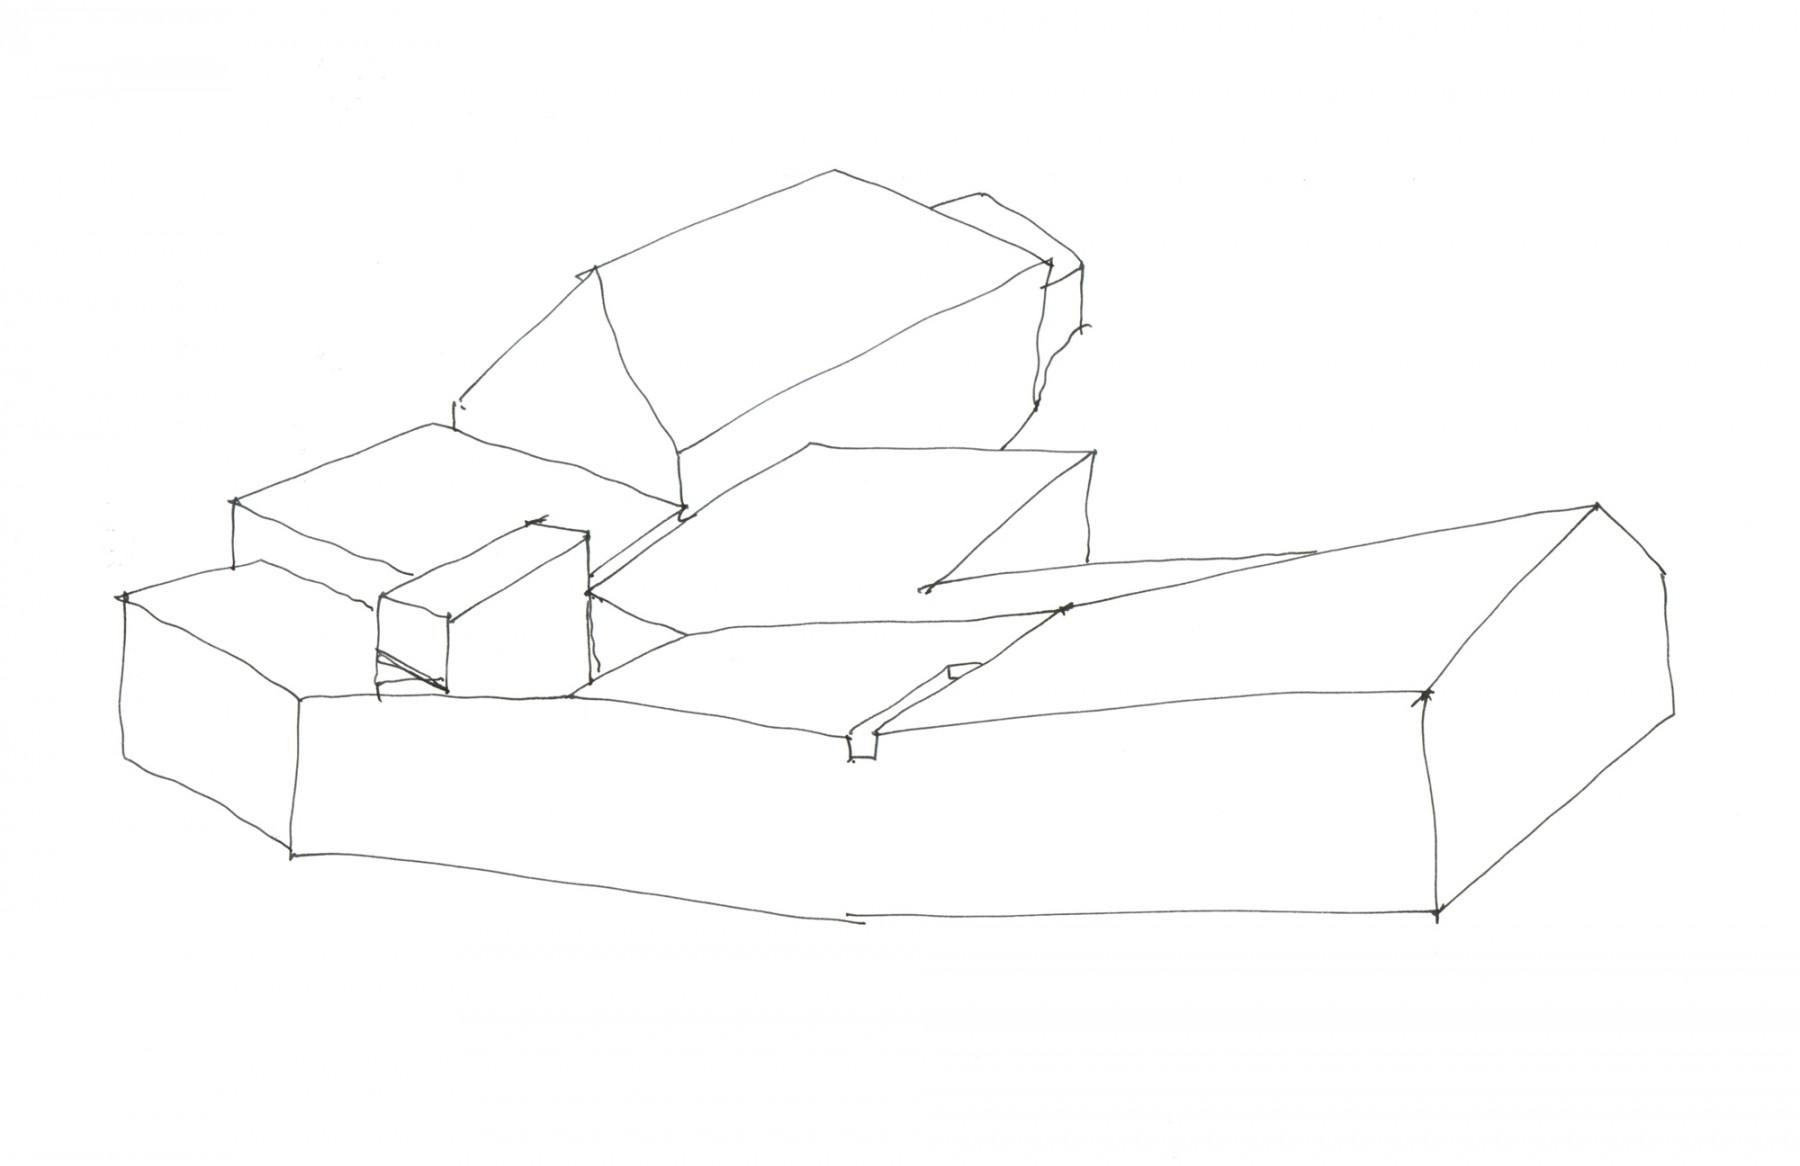 FaHa-Farm-house-barn-County-Clare-Ireland-residential-home-rural-timber-zinc-Jamie-Fobert-Architects-2